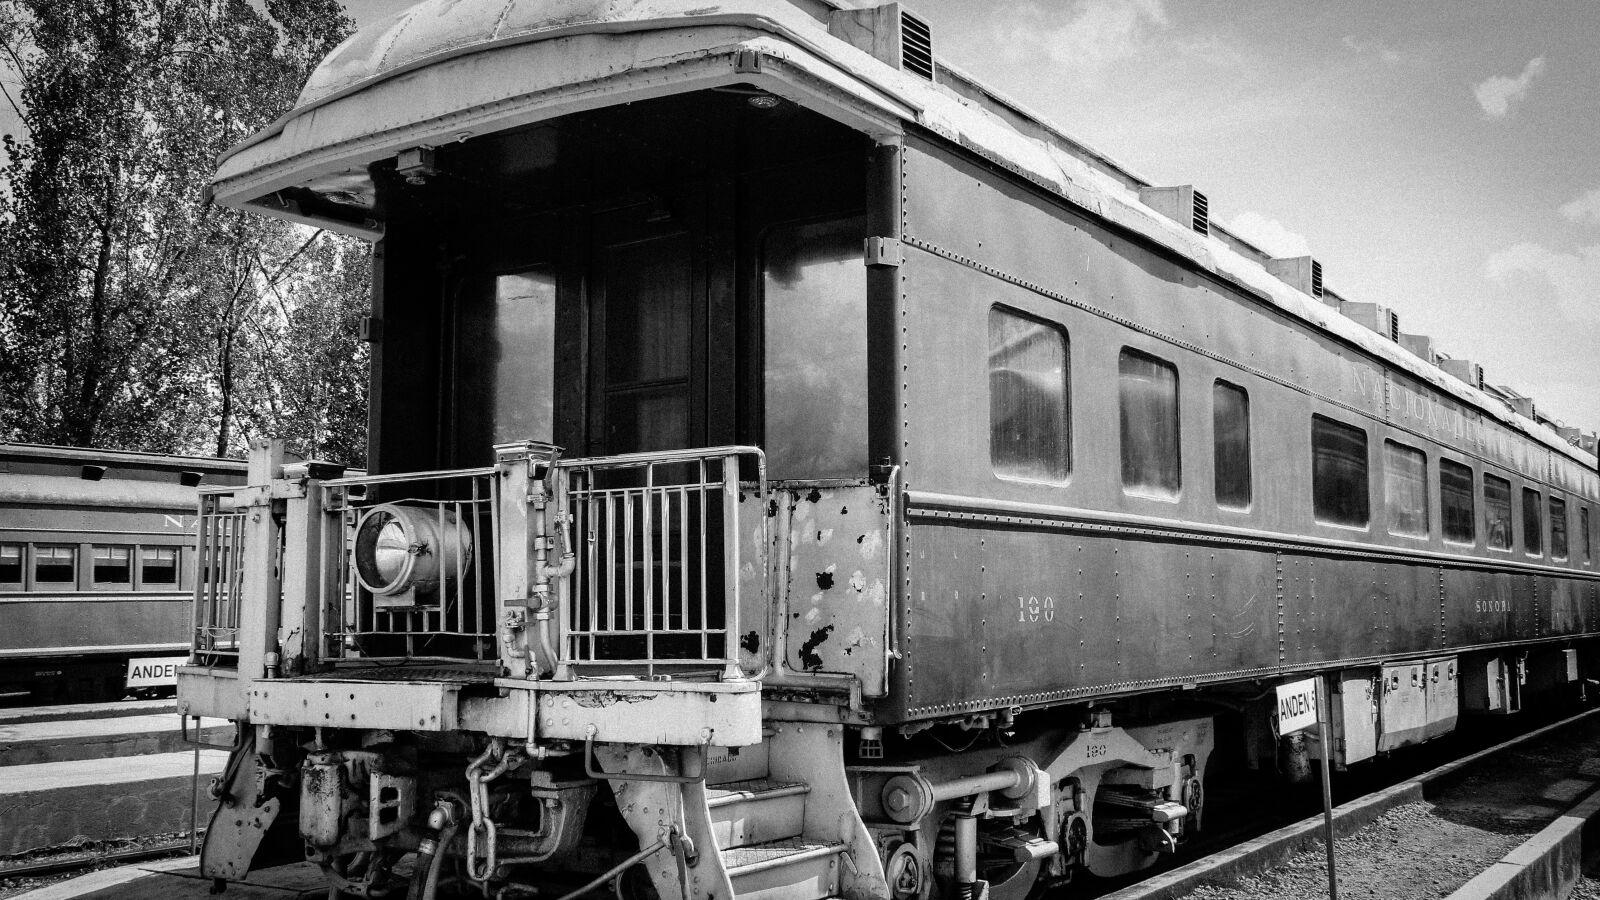 "Canon EOS 600D (Rebel EOS T3i / EOS Kiss X5) sample photo. ""Train, railway, station"" photography"